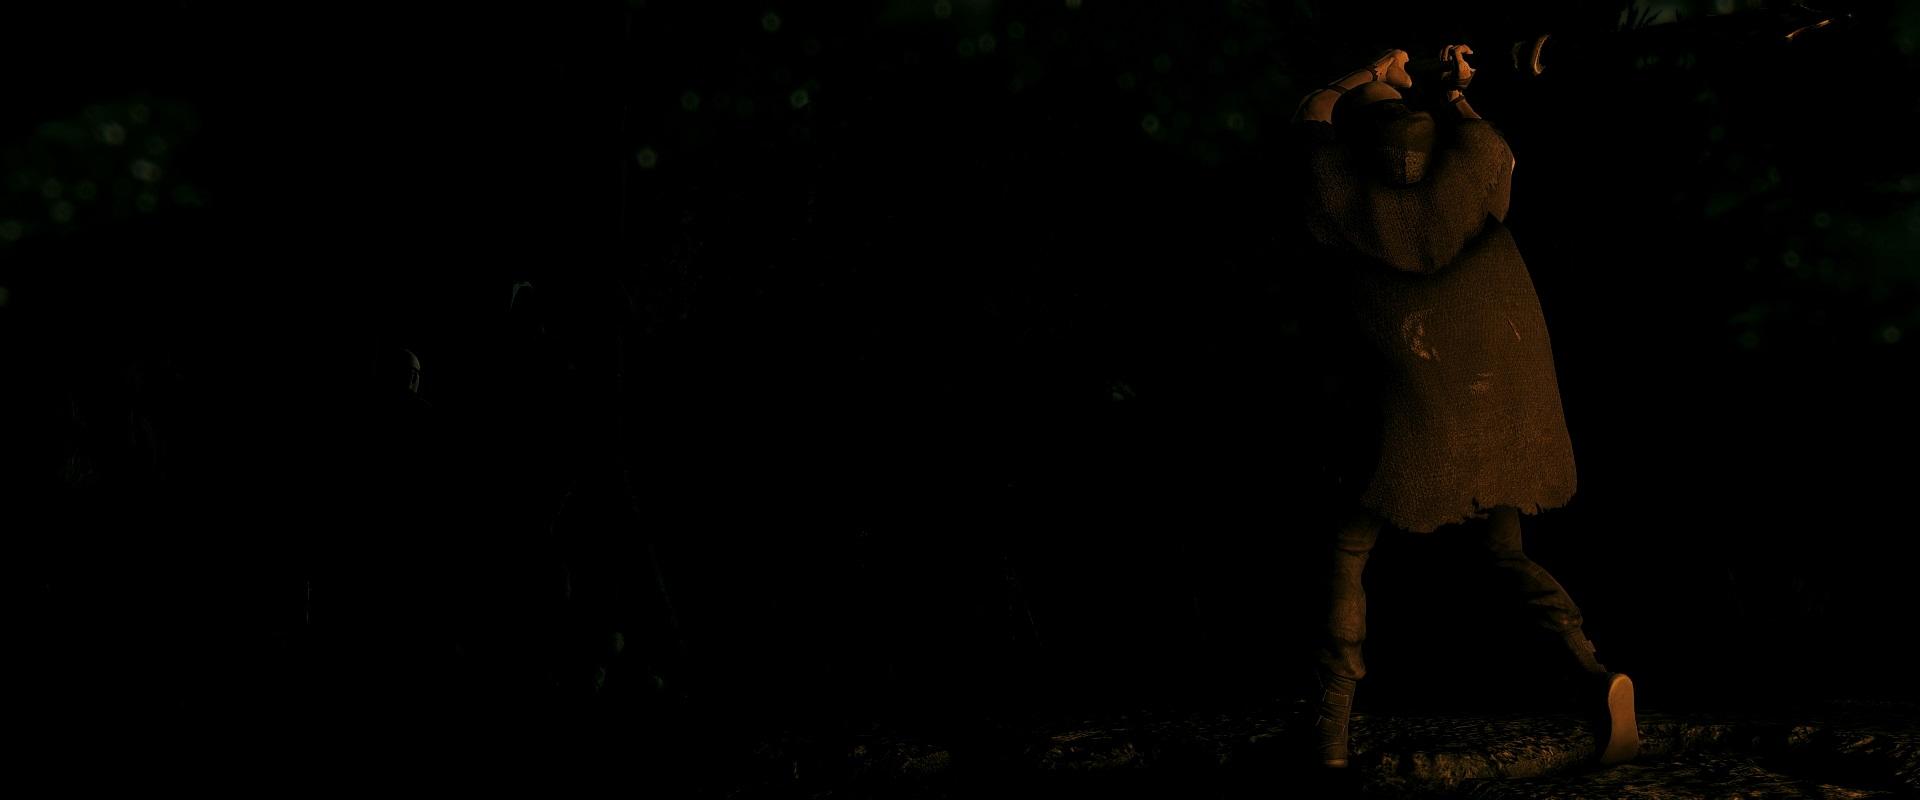 [CONTEST] VGU Rules the Dark - ENTRIES 4F7Jtg2I